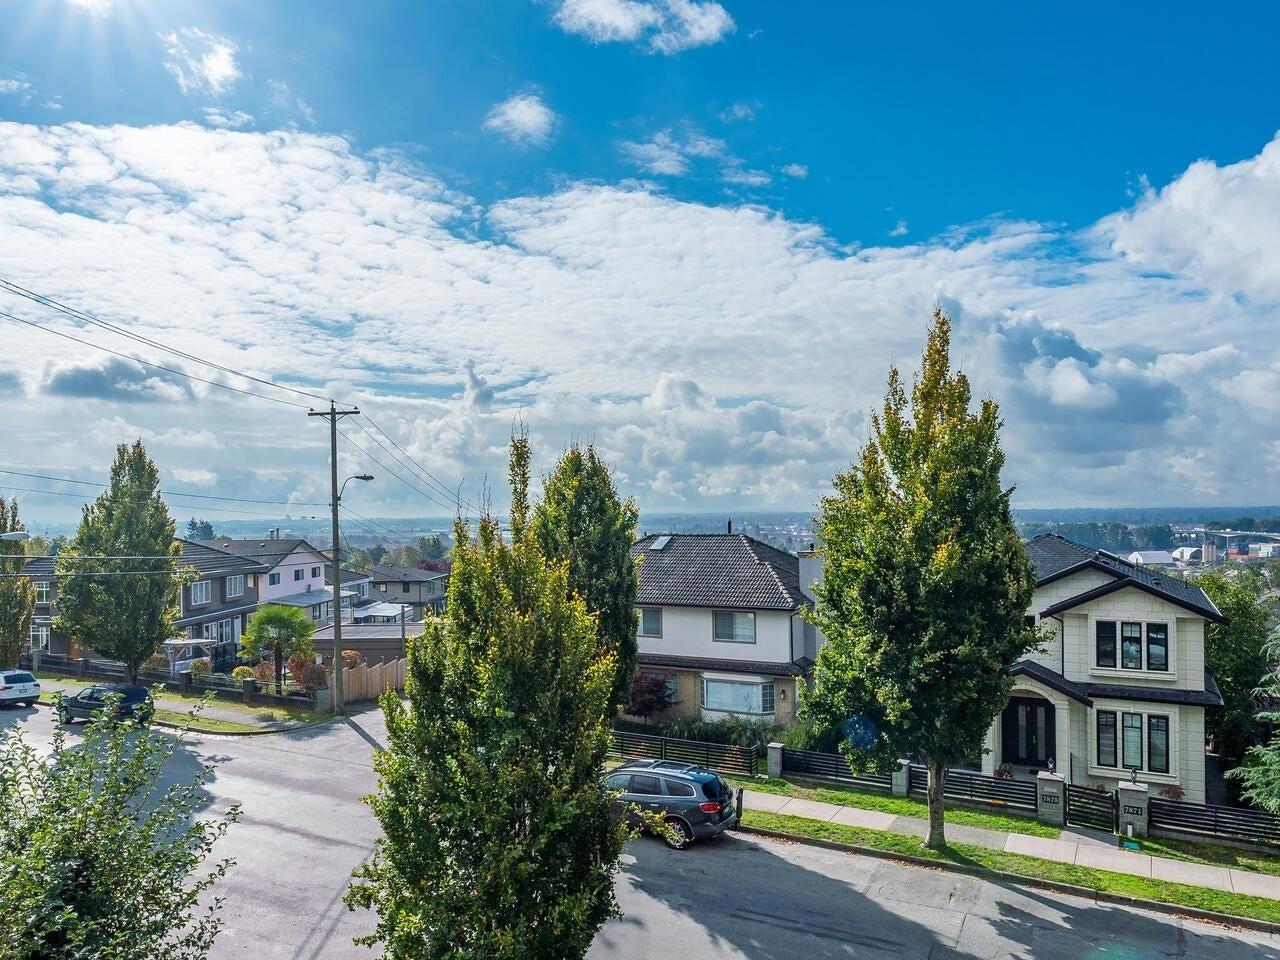 7888 JASPER CRESCENT - Fraserview VE House/Single Family for sale, 7 Bedrooms (R2622945) - #24